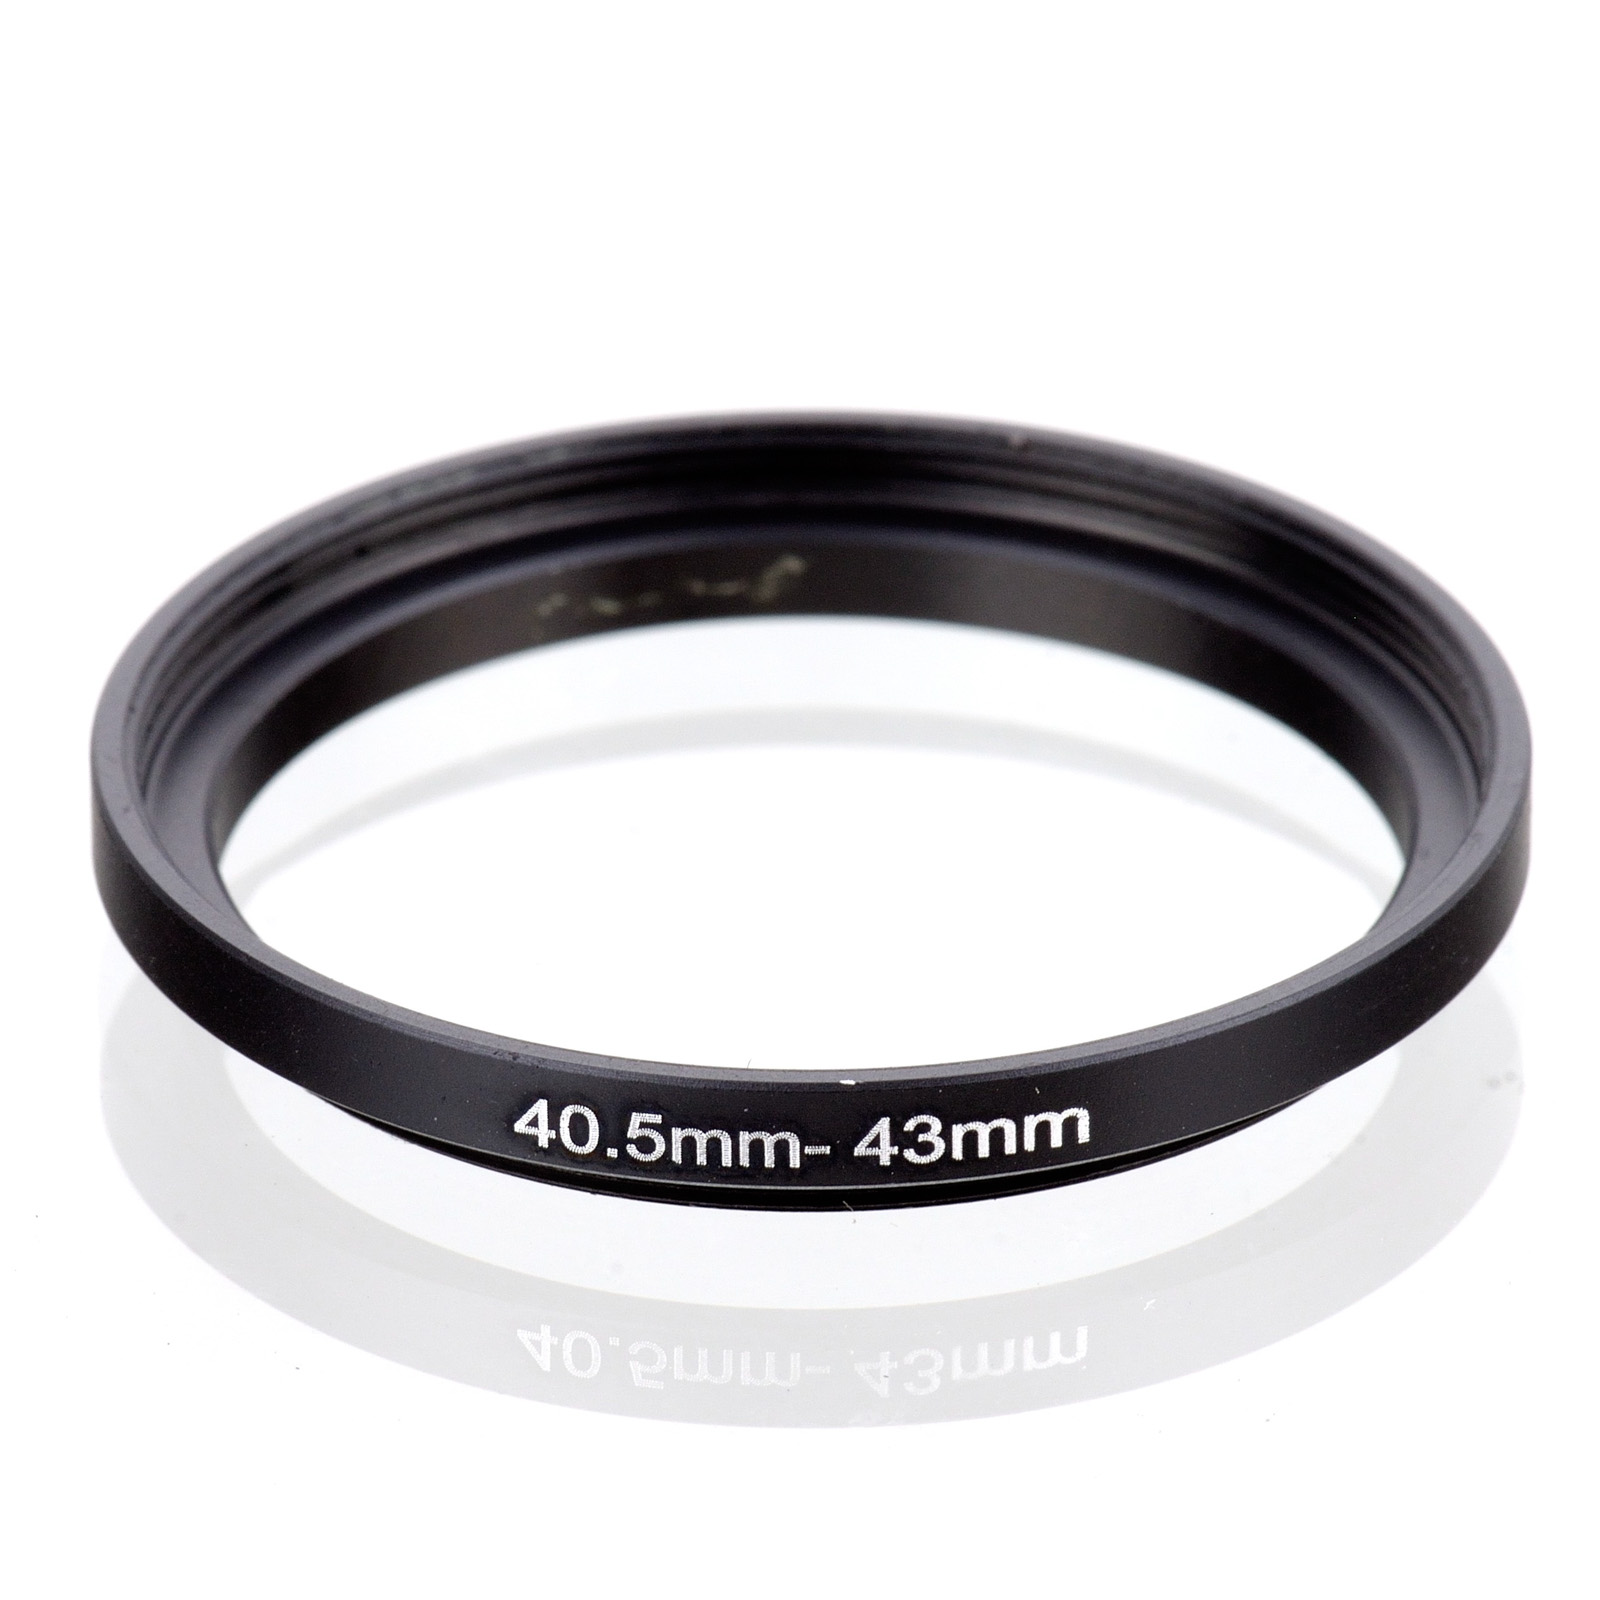 Filteradapter Step-Up Ring 40,5mm-49mm Adapterring